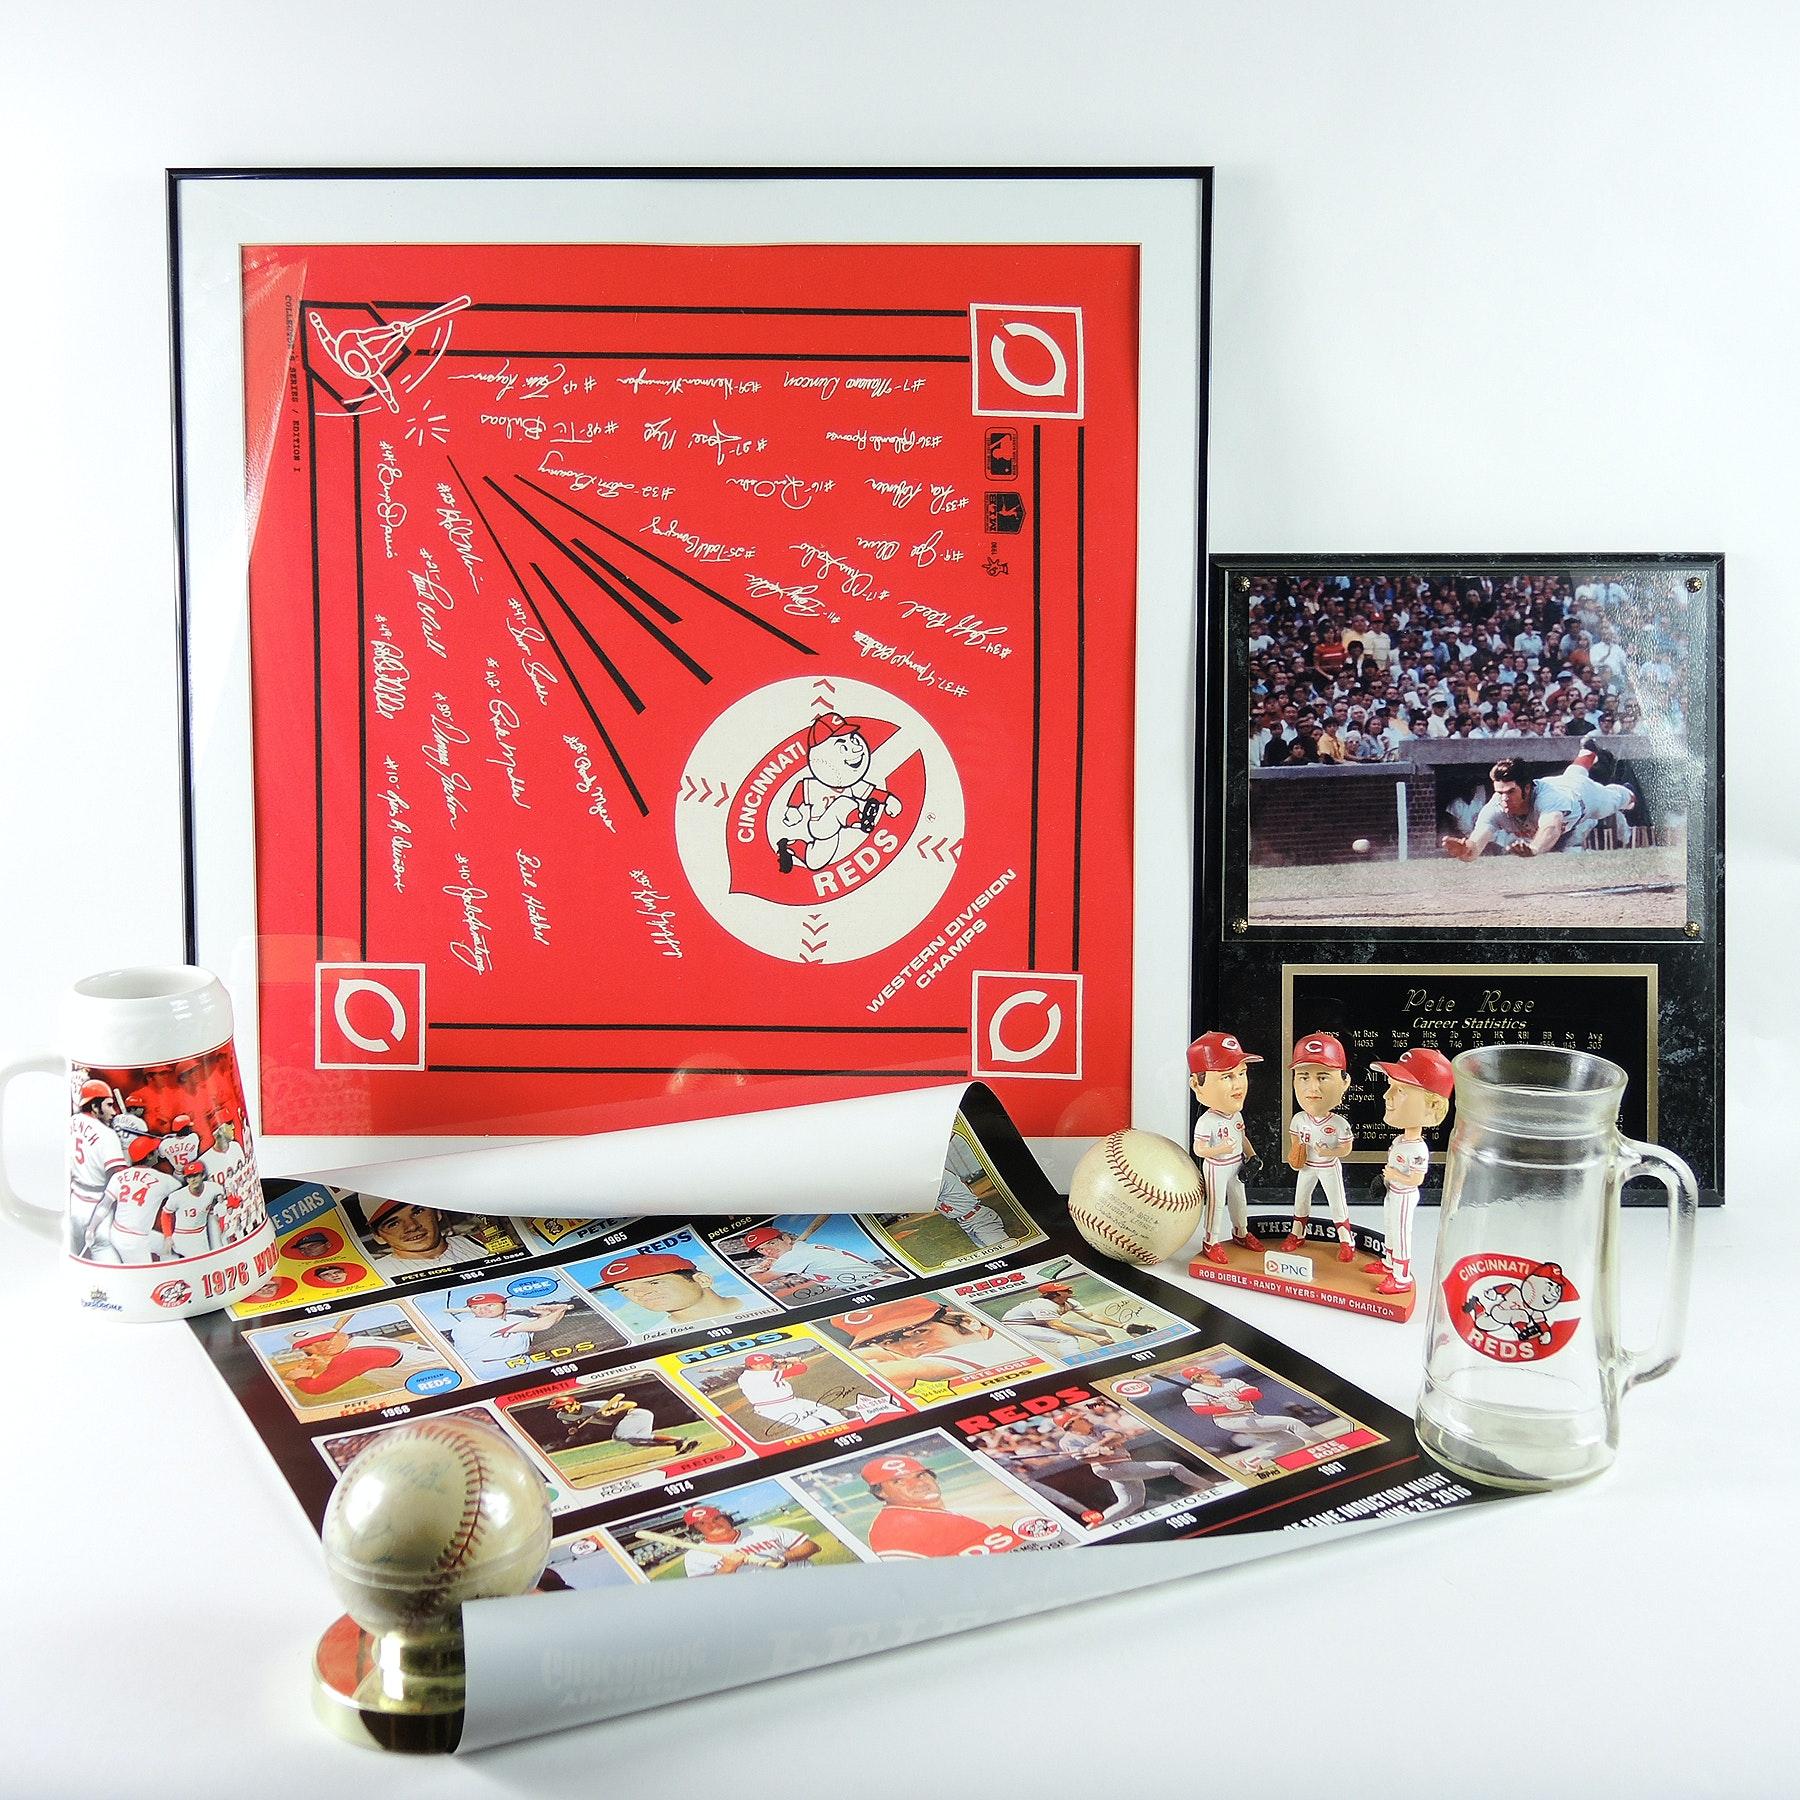 Cincinnati Reds Memorabilia Including Signed Baseball